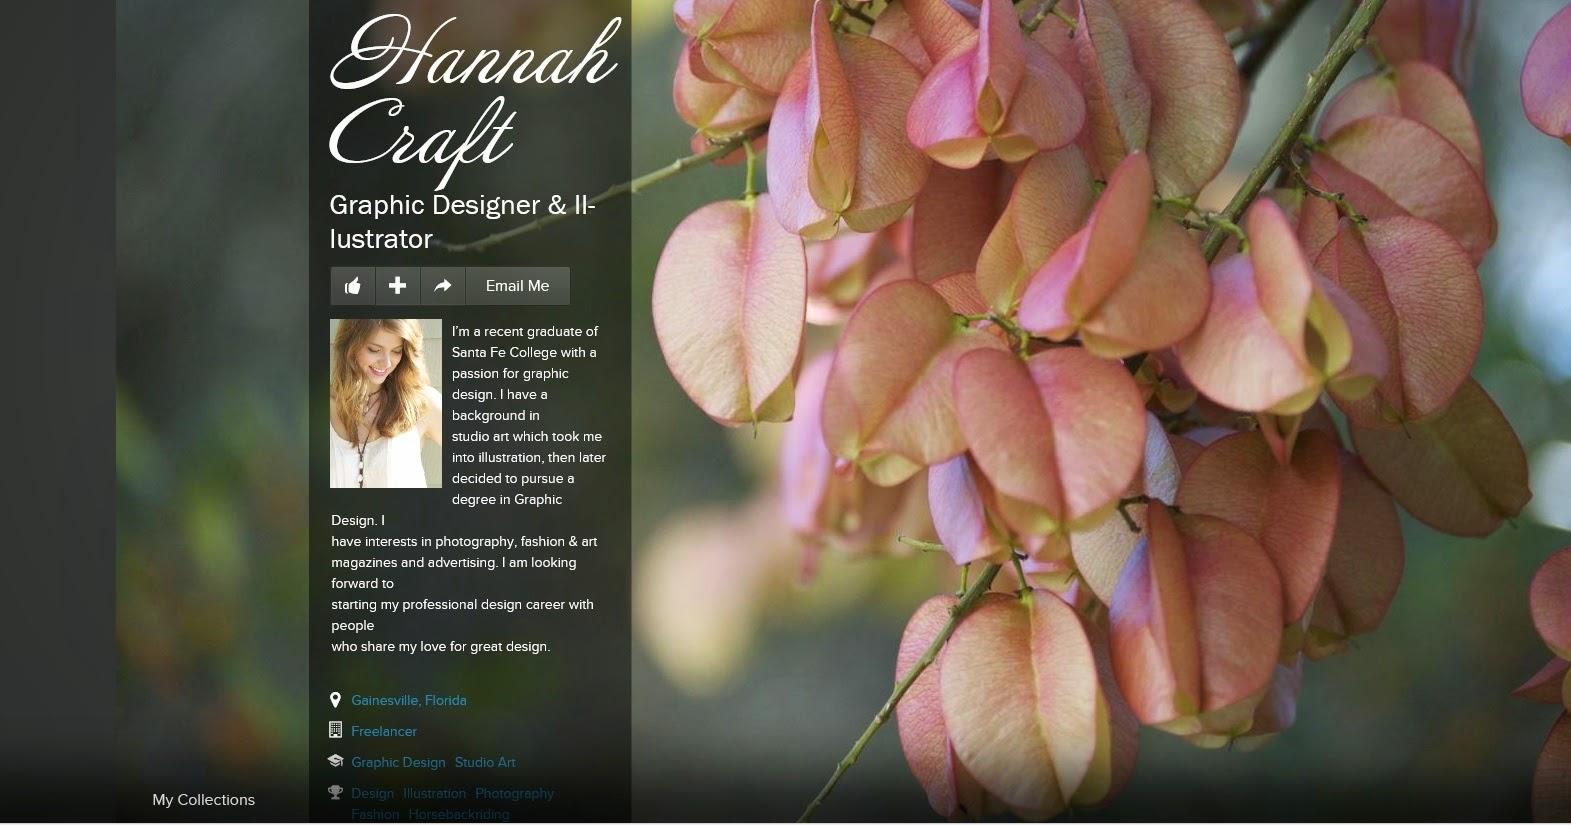 Hannah Craft, Graphic Designer & Illustrator